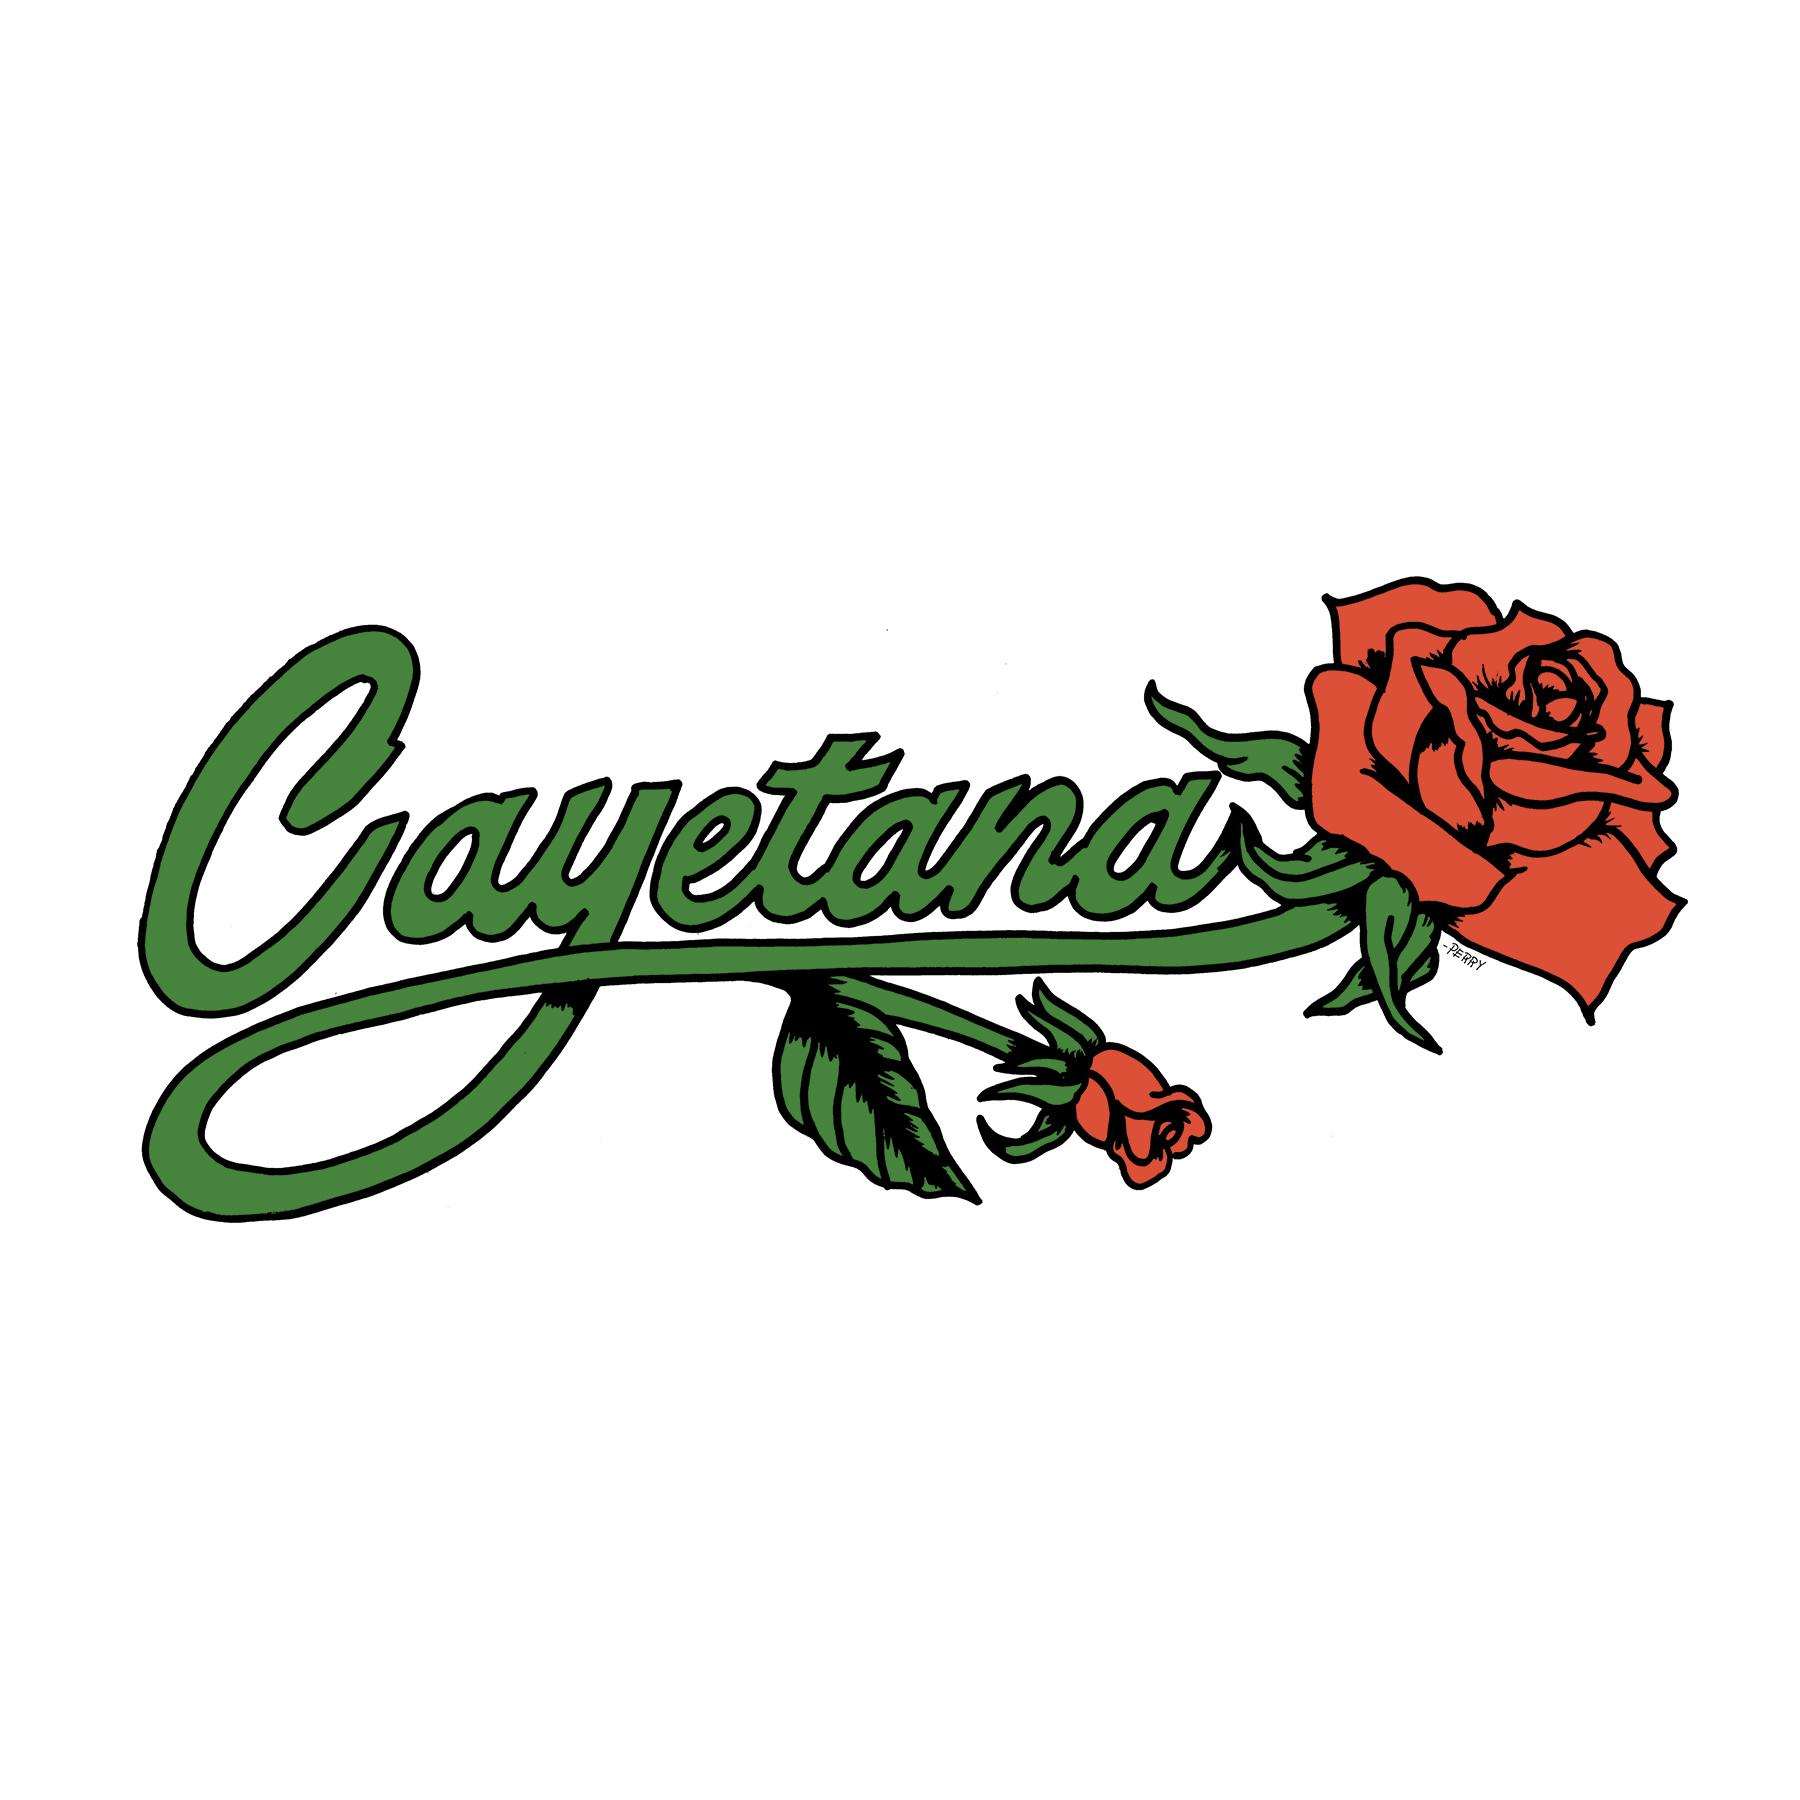 Cayetana front.jpg